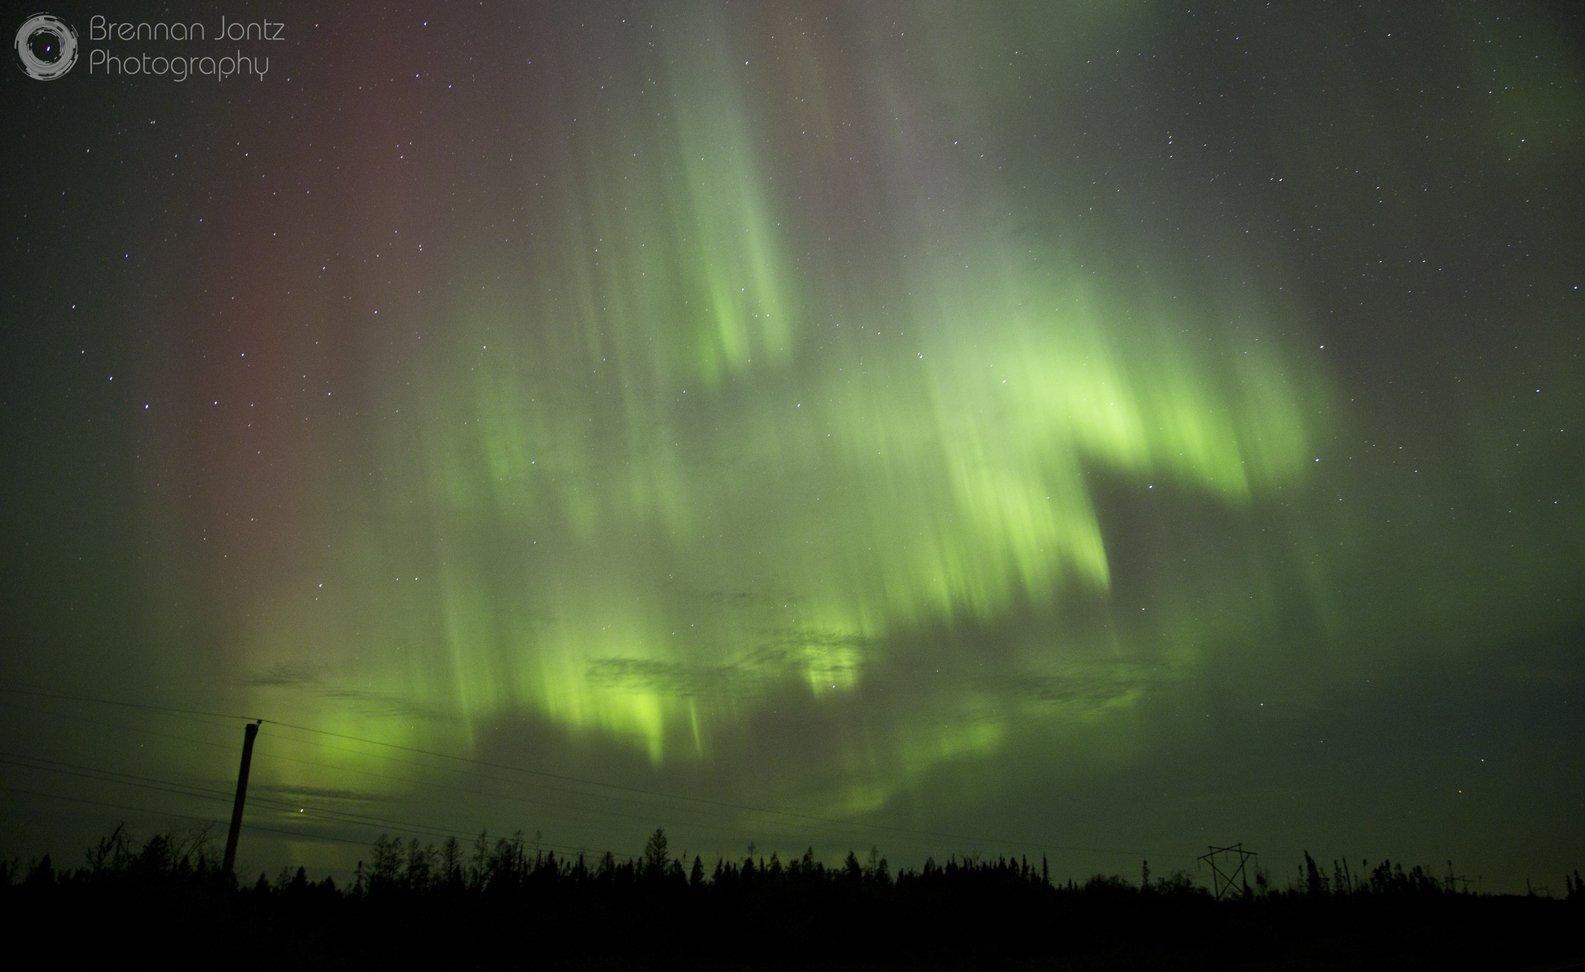 solar storm upcoming - photo #6